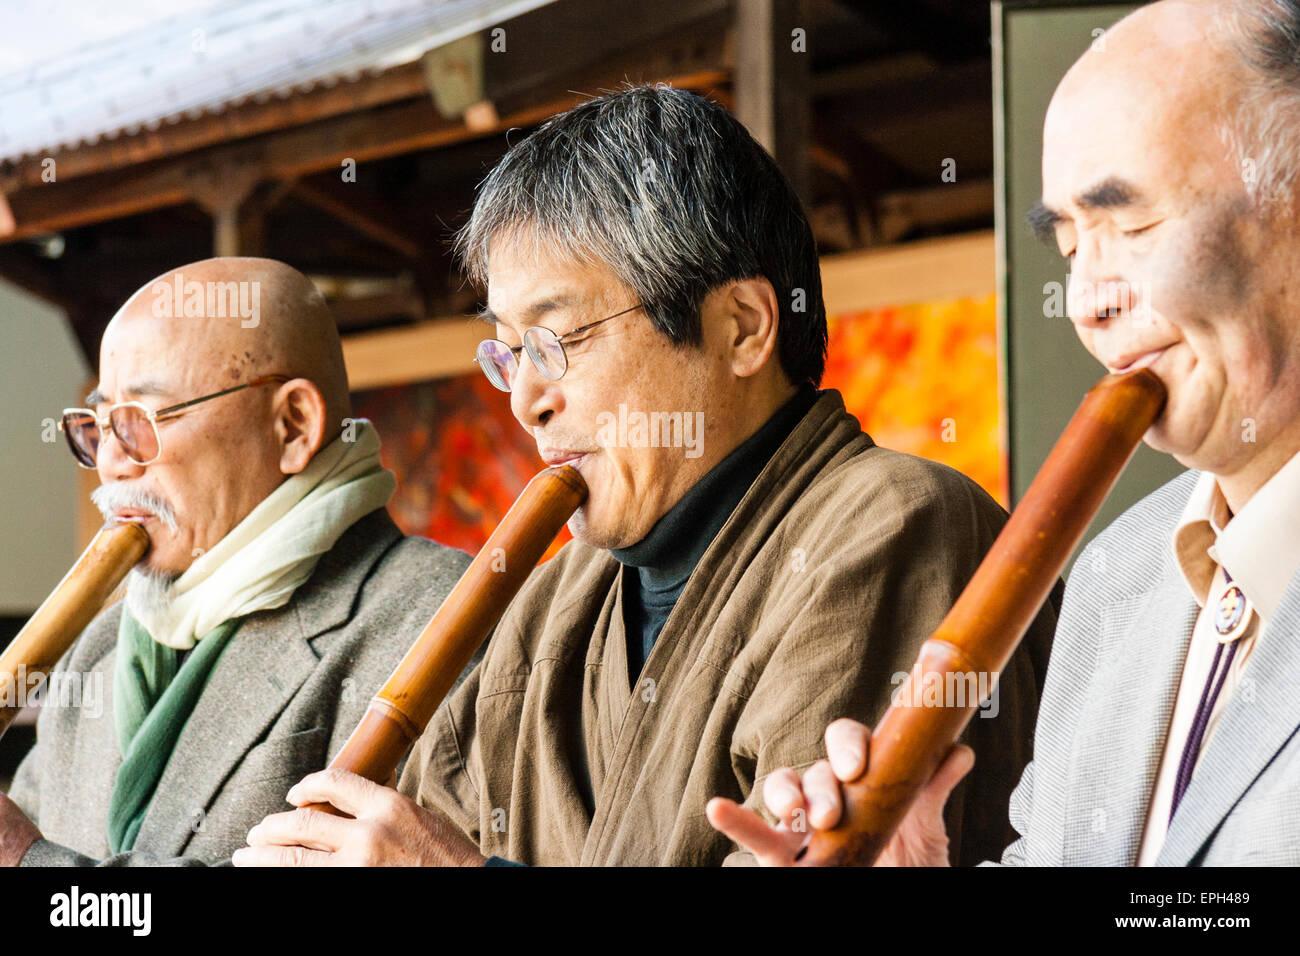 Japan, Nishinomiya, Koshiki-wa shrine. Row of elderly men in suits and jackets kneeling on stage playing flute recital. - Stock Image